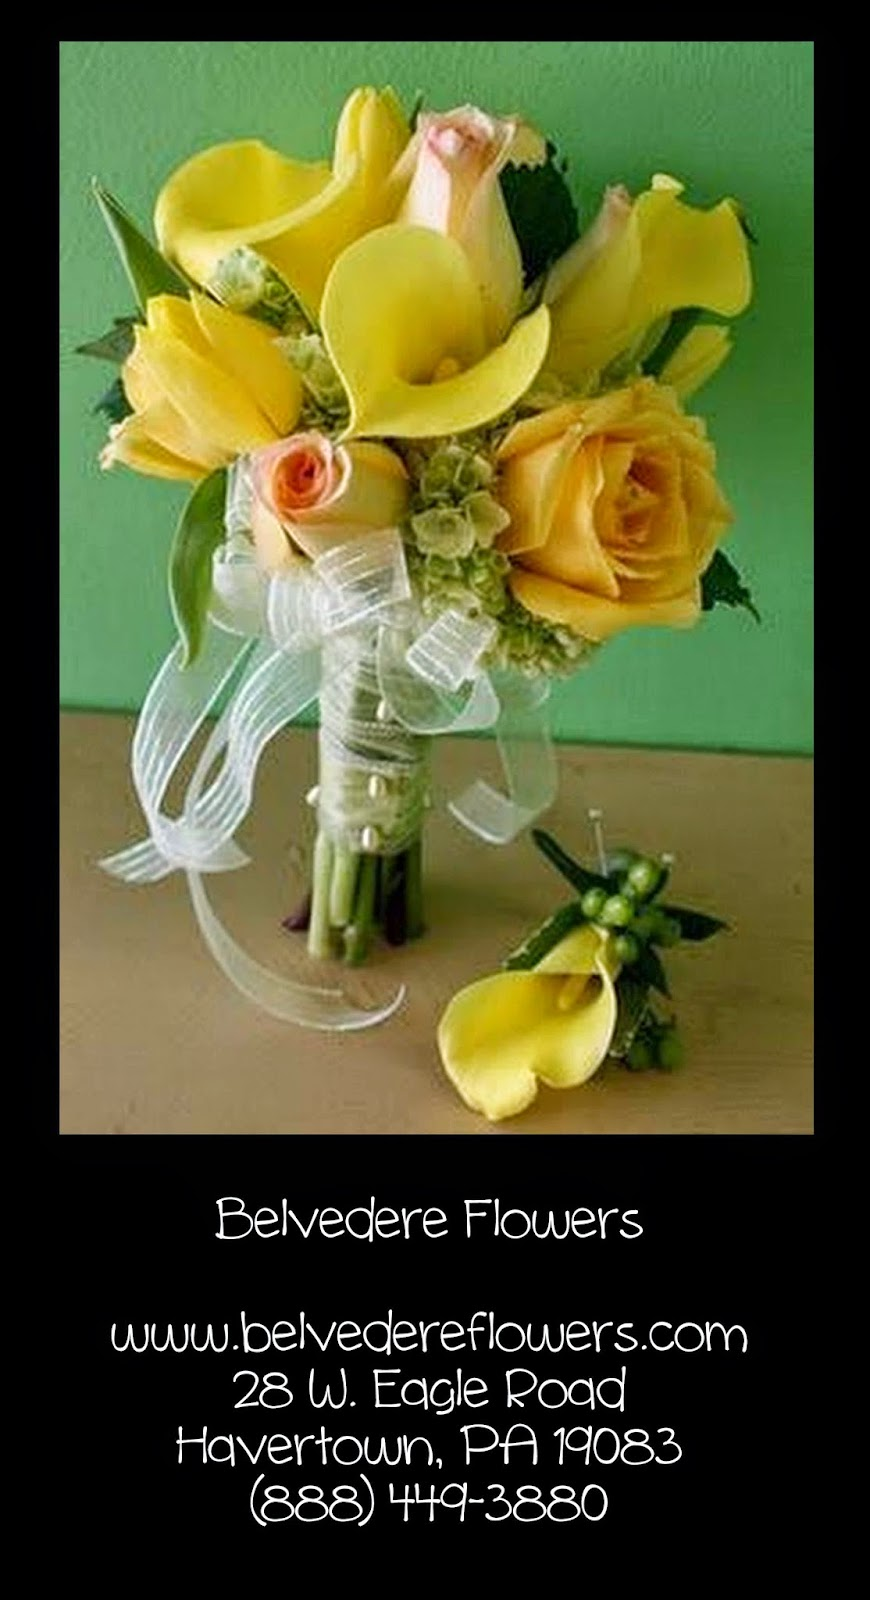 http://www.belvedereflowers.com/